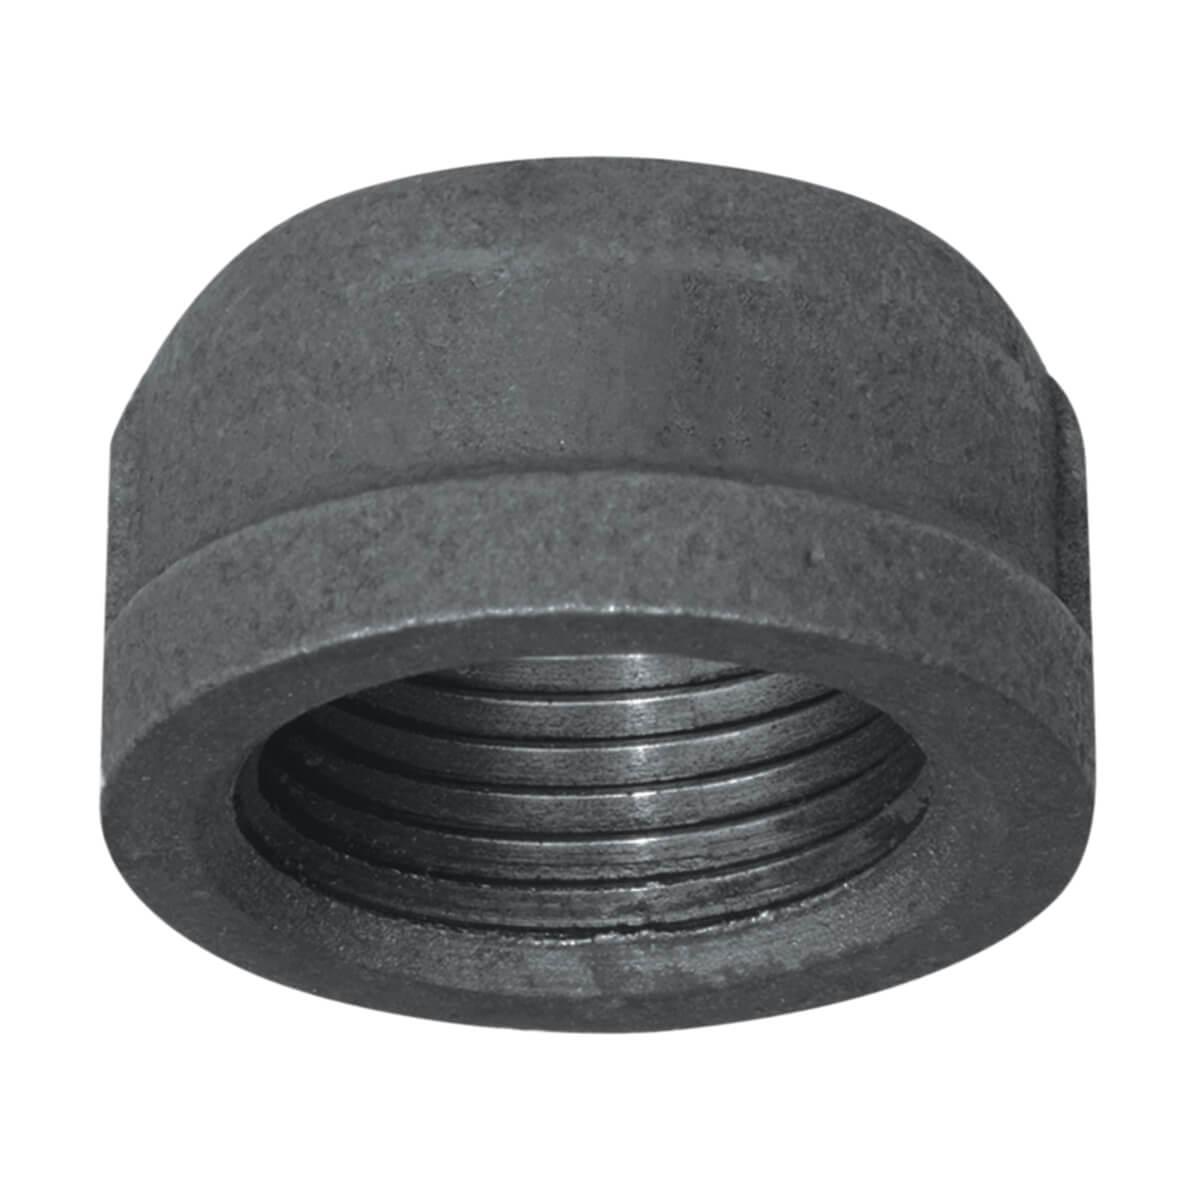 Fitting Black Iron Cap - 3/8-in